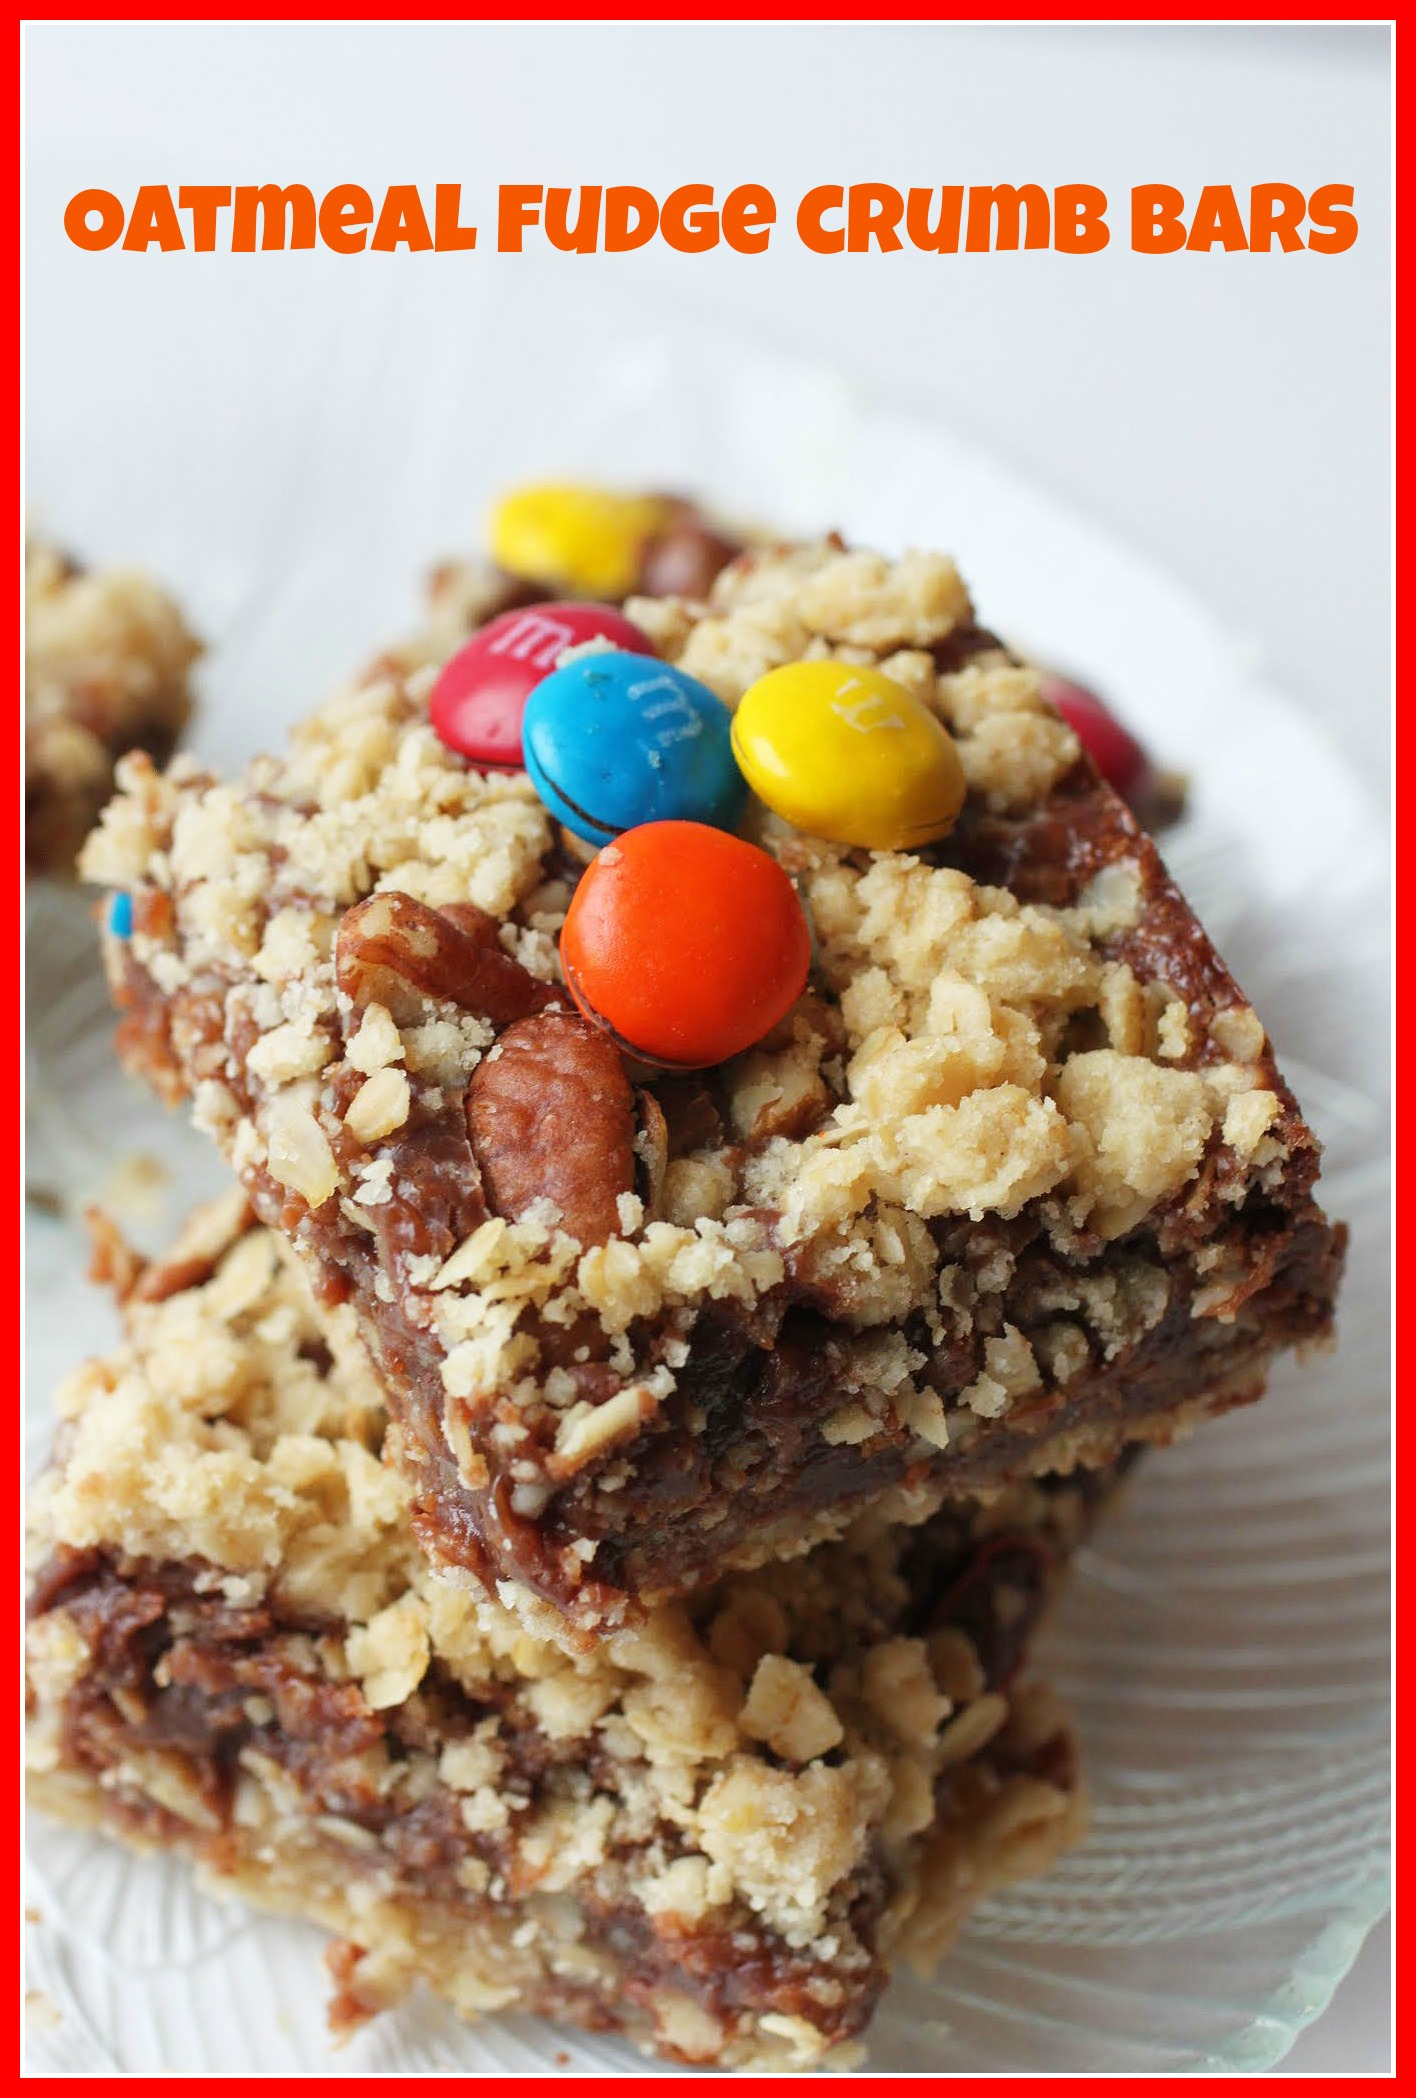 Oatmeal Fudge Crumb Bars